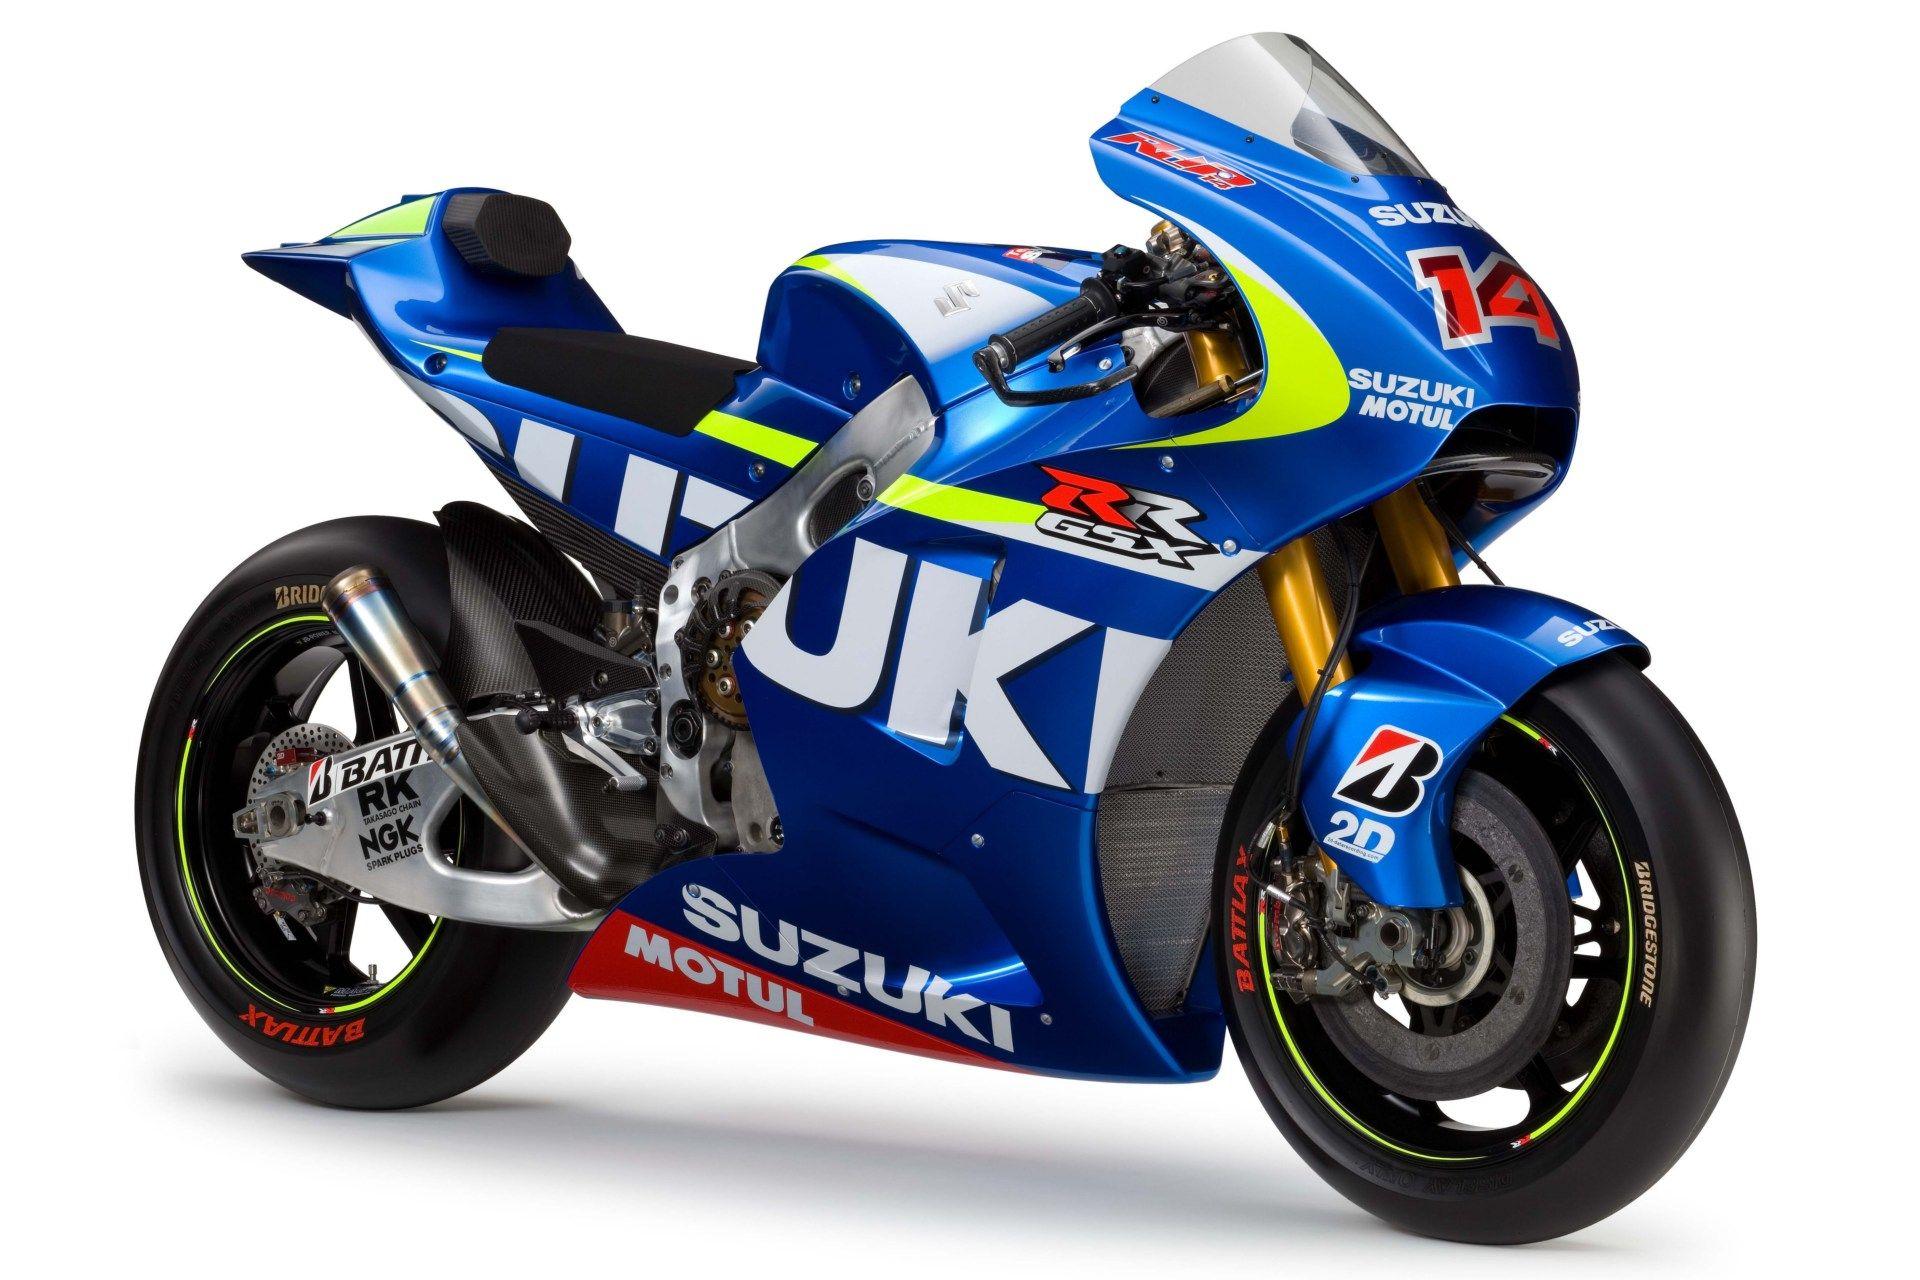 Lovely Suzuki Confirms MotoGP Entry In 2015 With Maverick Vinales And Aleix  Espargaro.